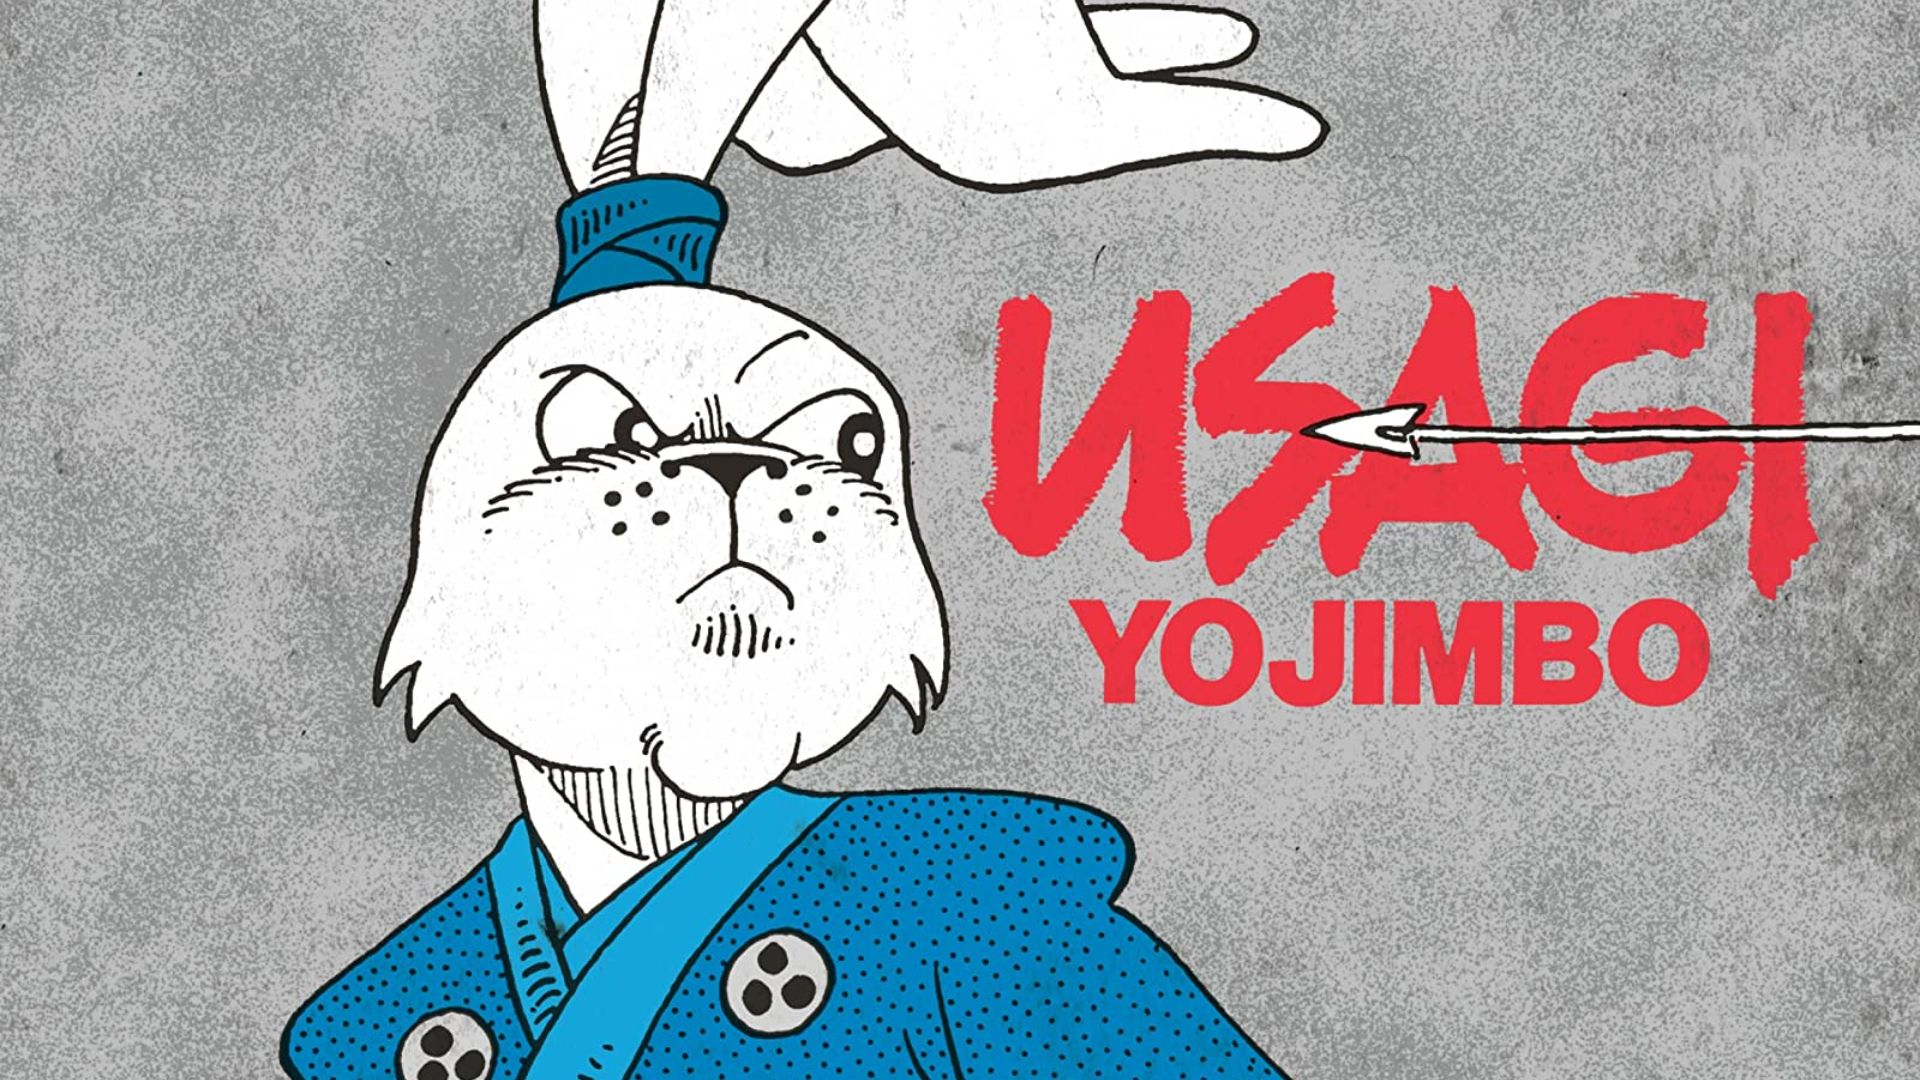 Usagi Yojimbo Netflix annonce l'adaptation en série